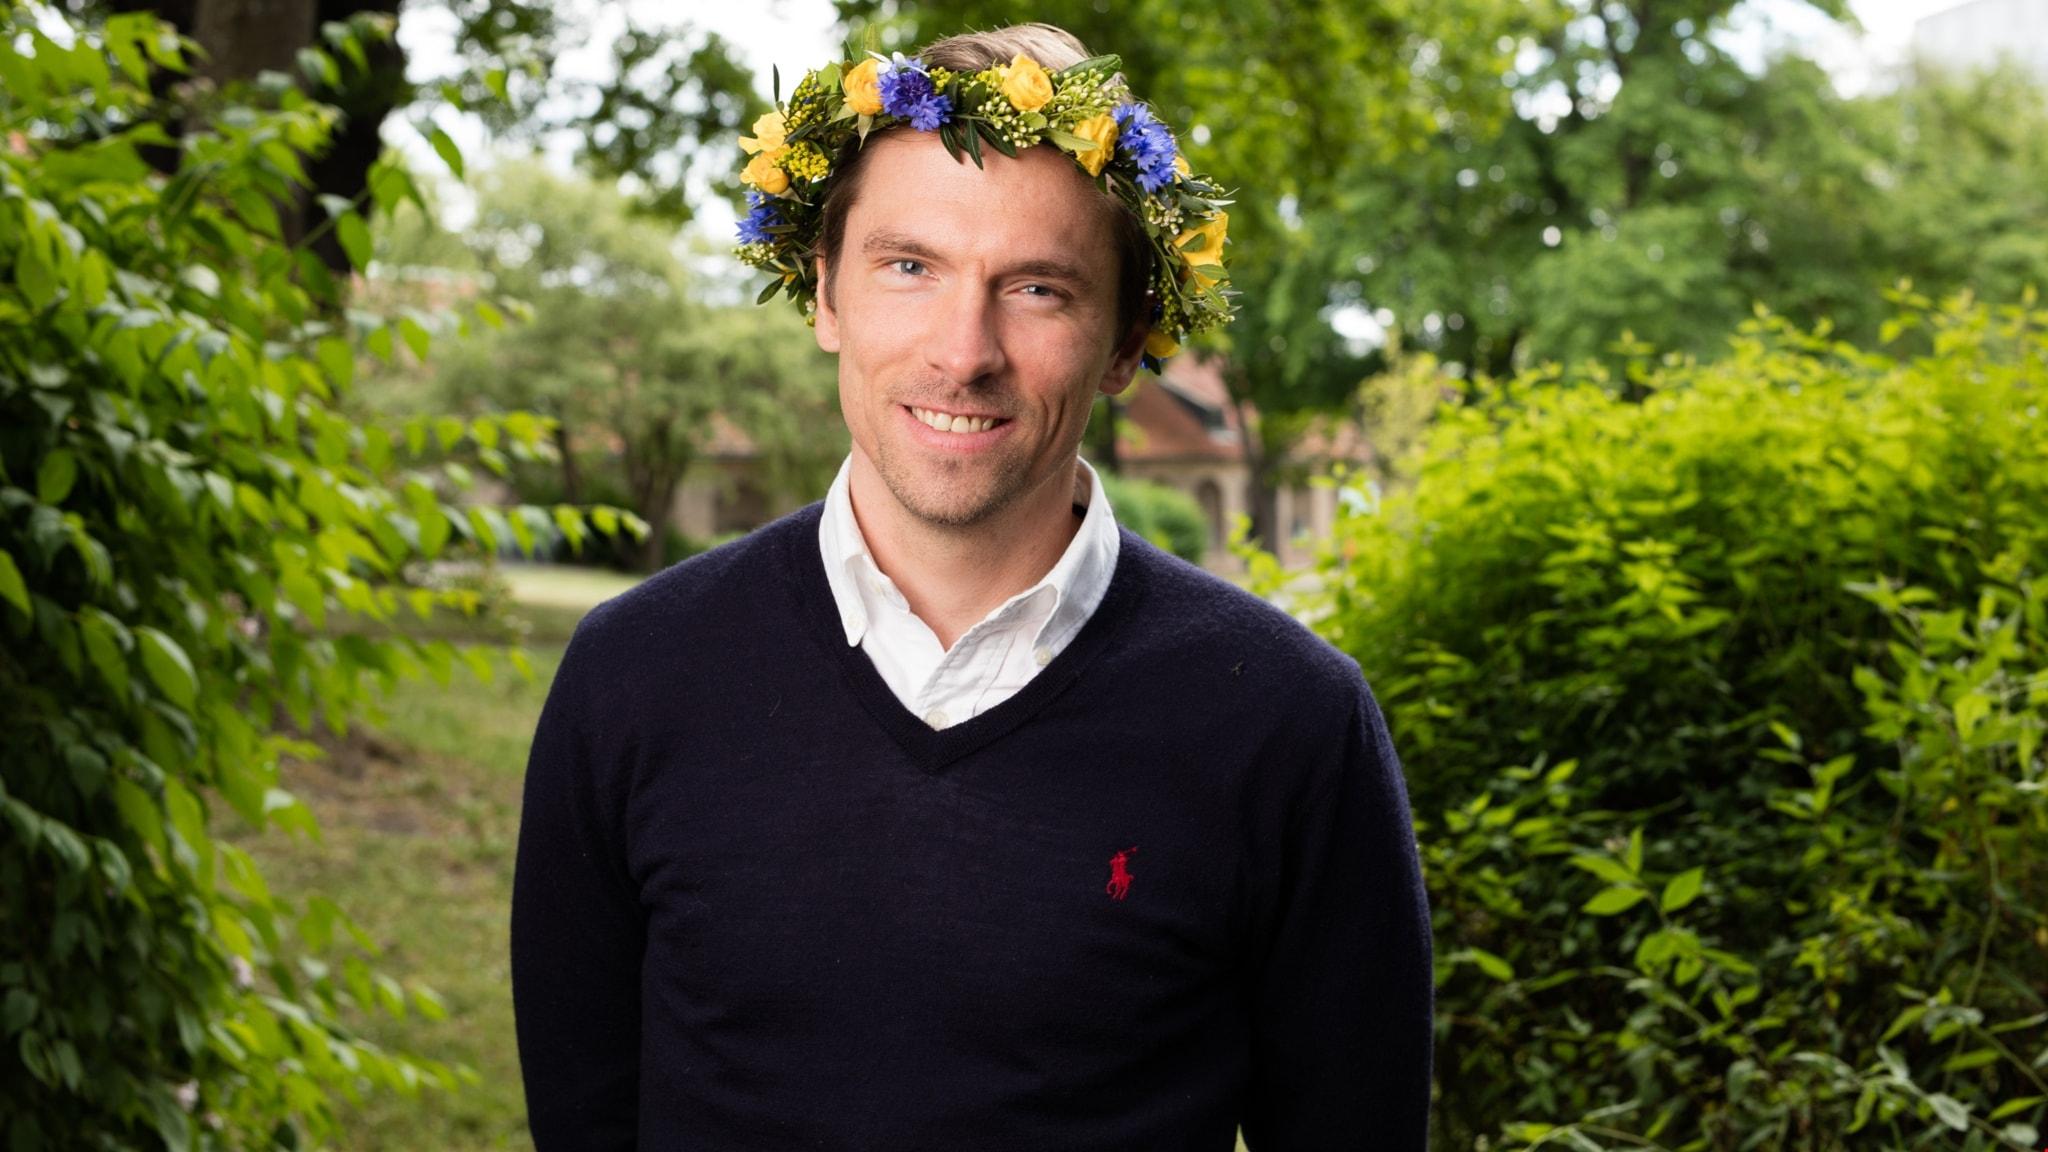 Johan Olsson krans